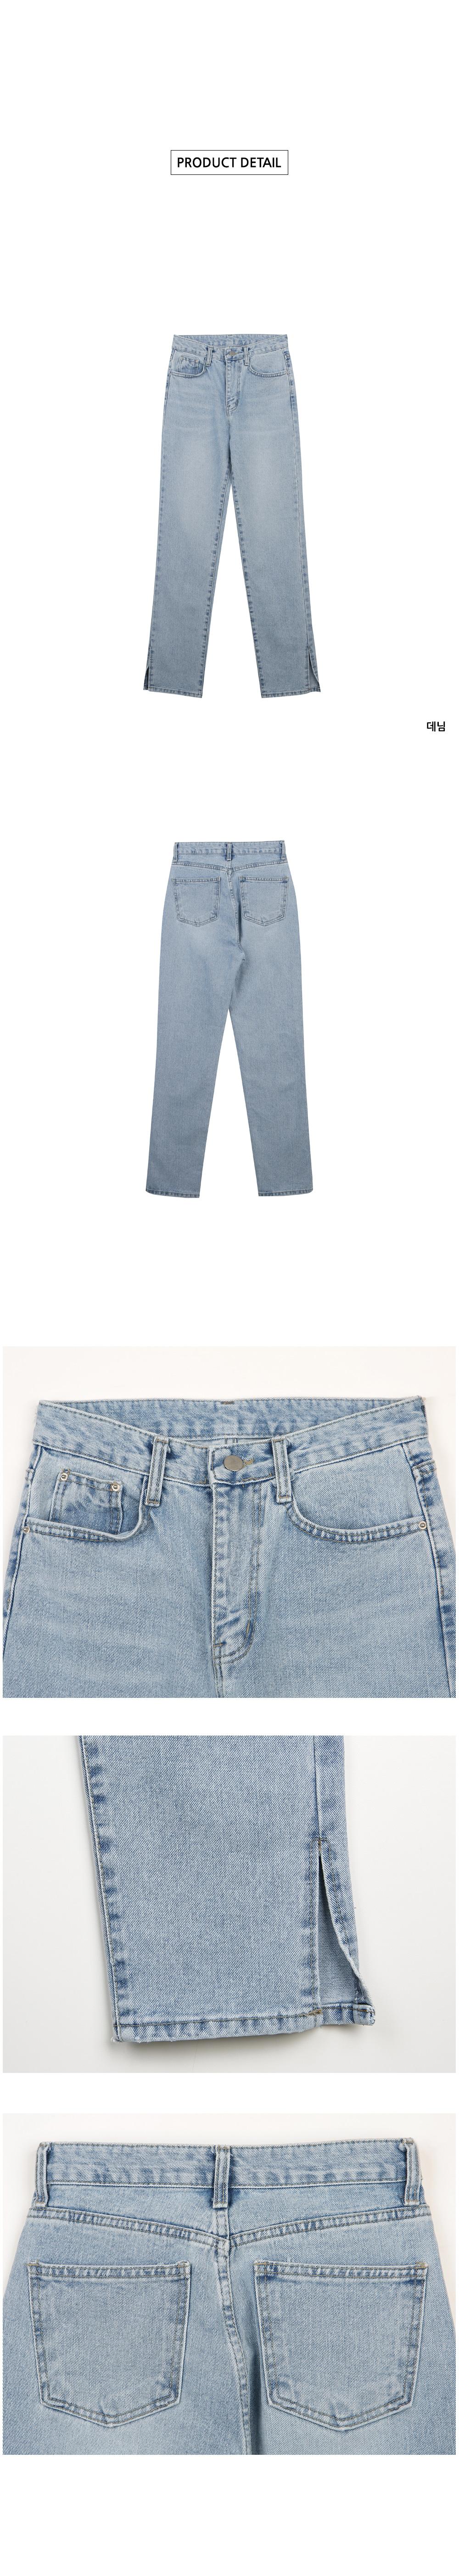 Bottom point denim pants P#YW478